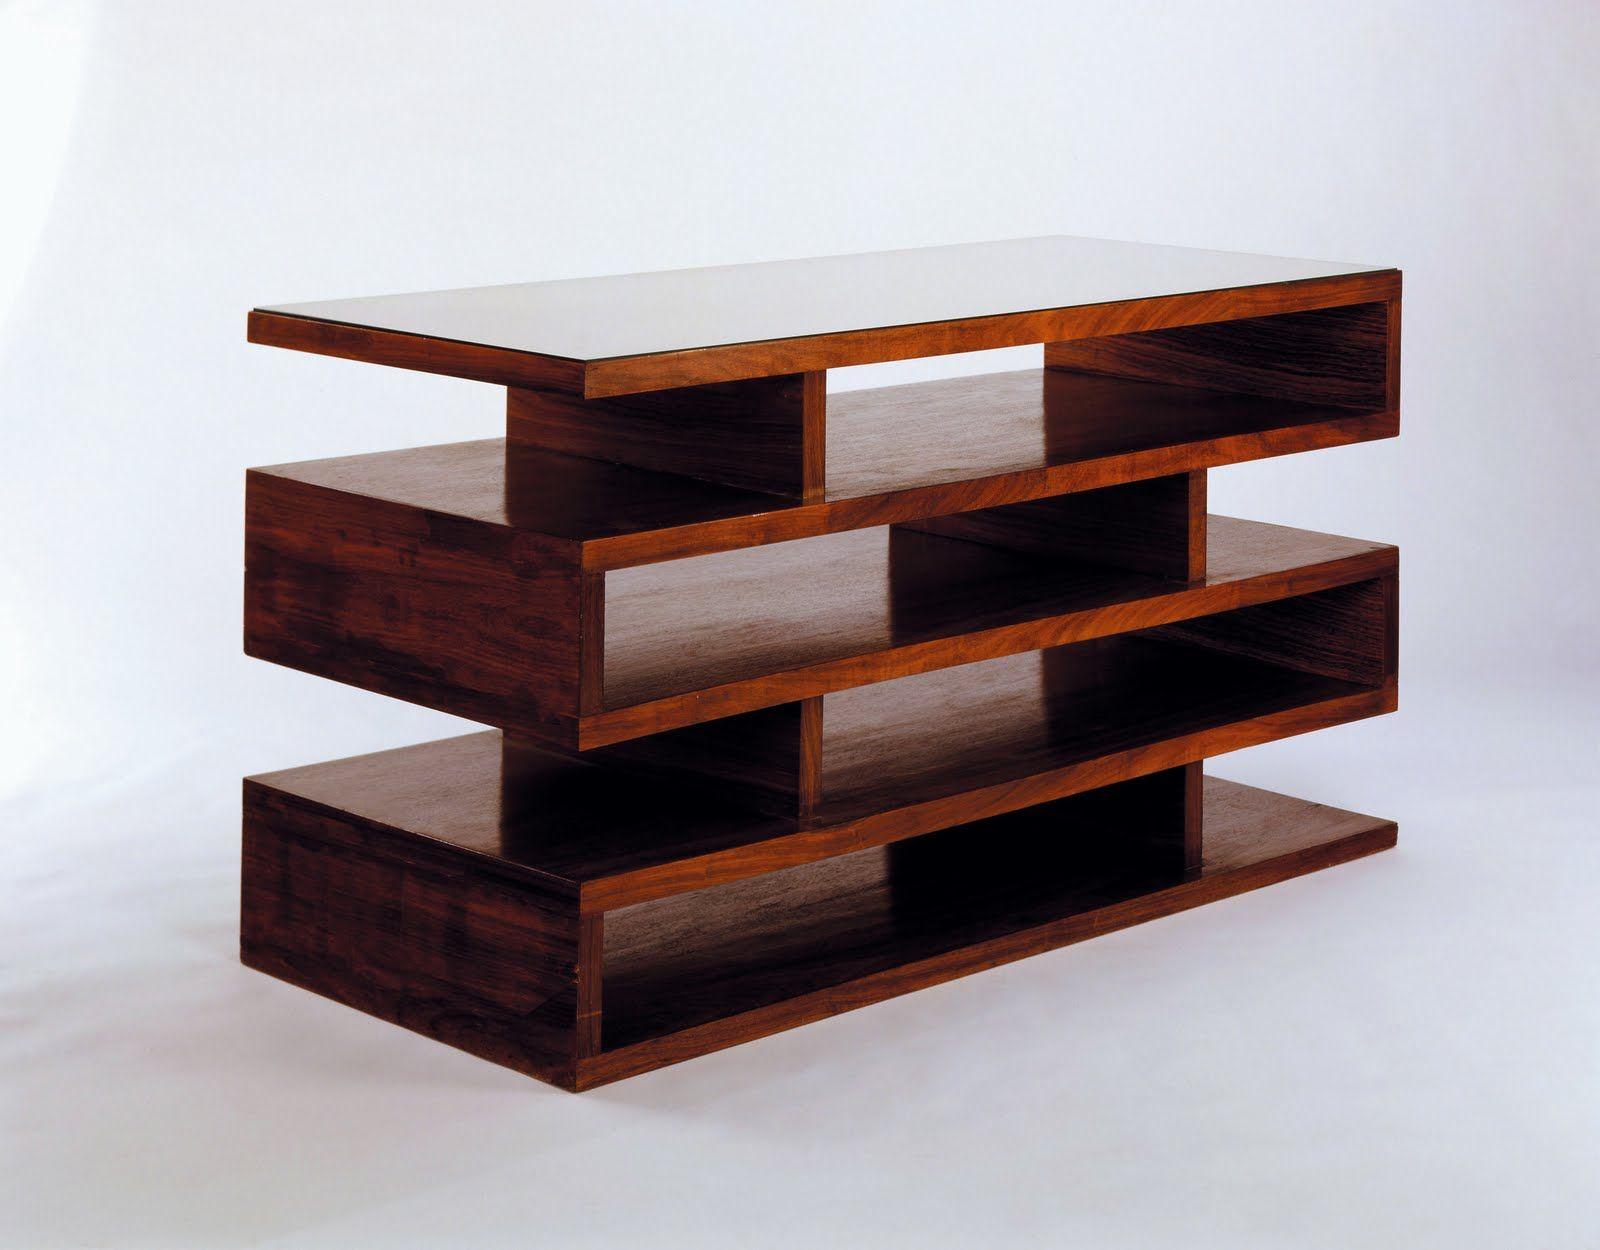 Bauhaus inspiration Bauhaus design, Walter gropius